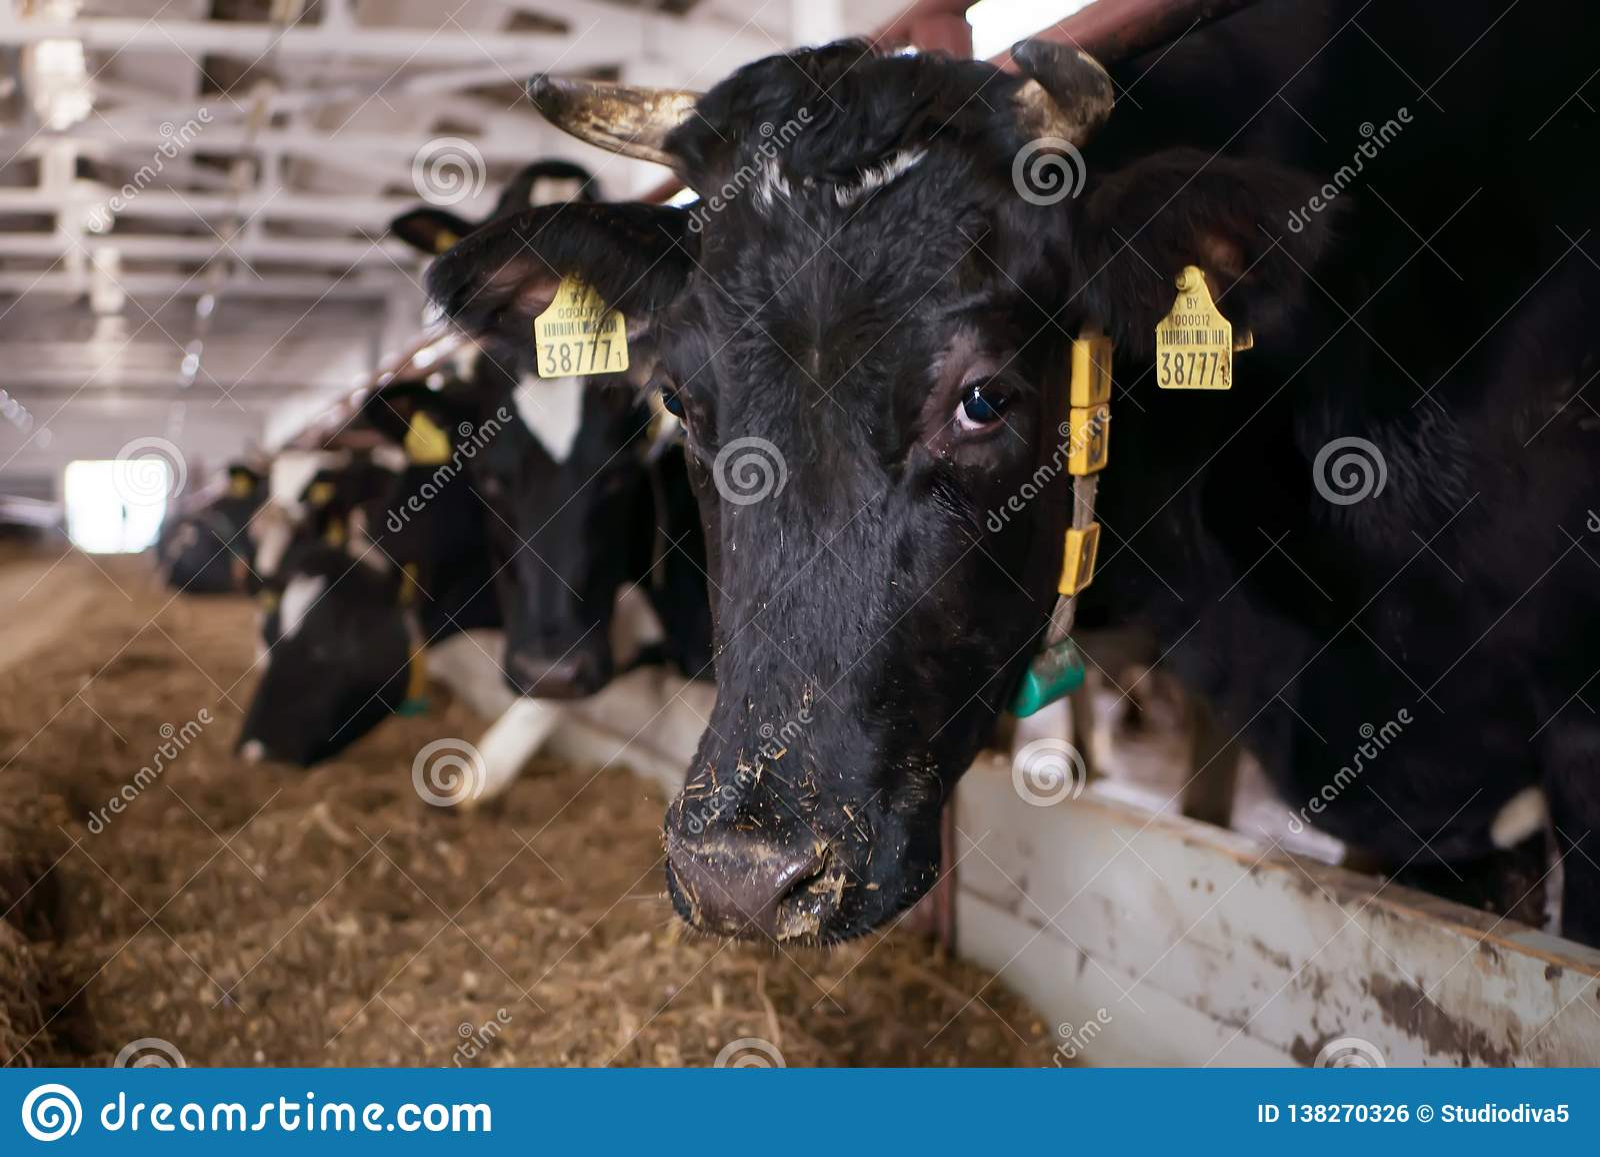 Primer principal de la vaca en una pluma en una granja lechera